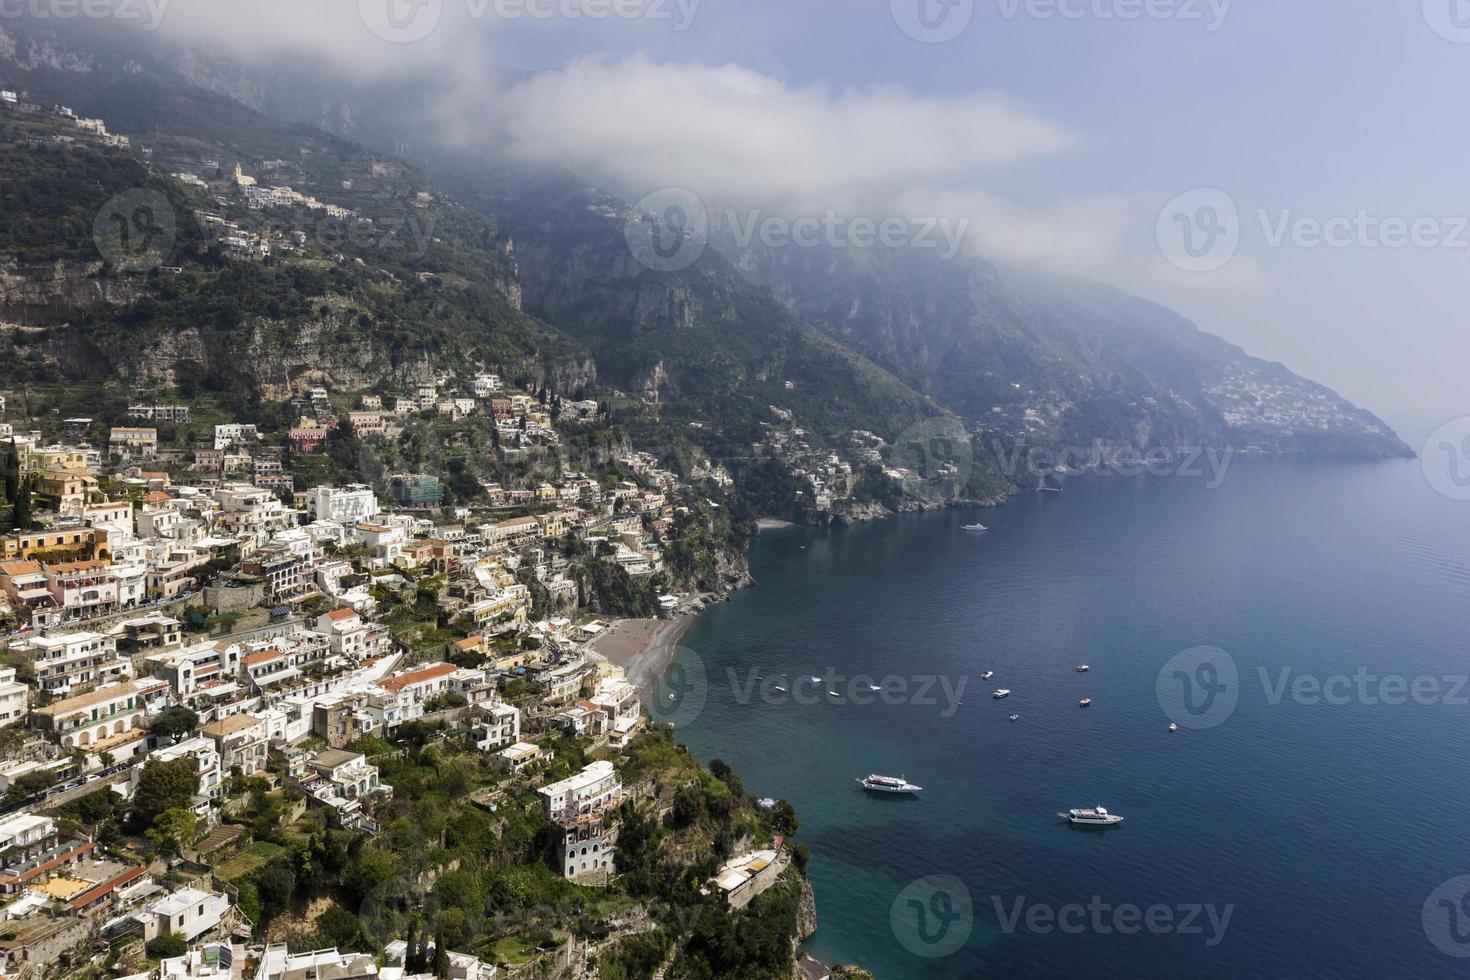 Village de Positano sur la côte amalfitaine, Italie photo